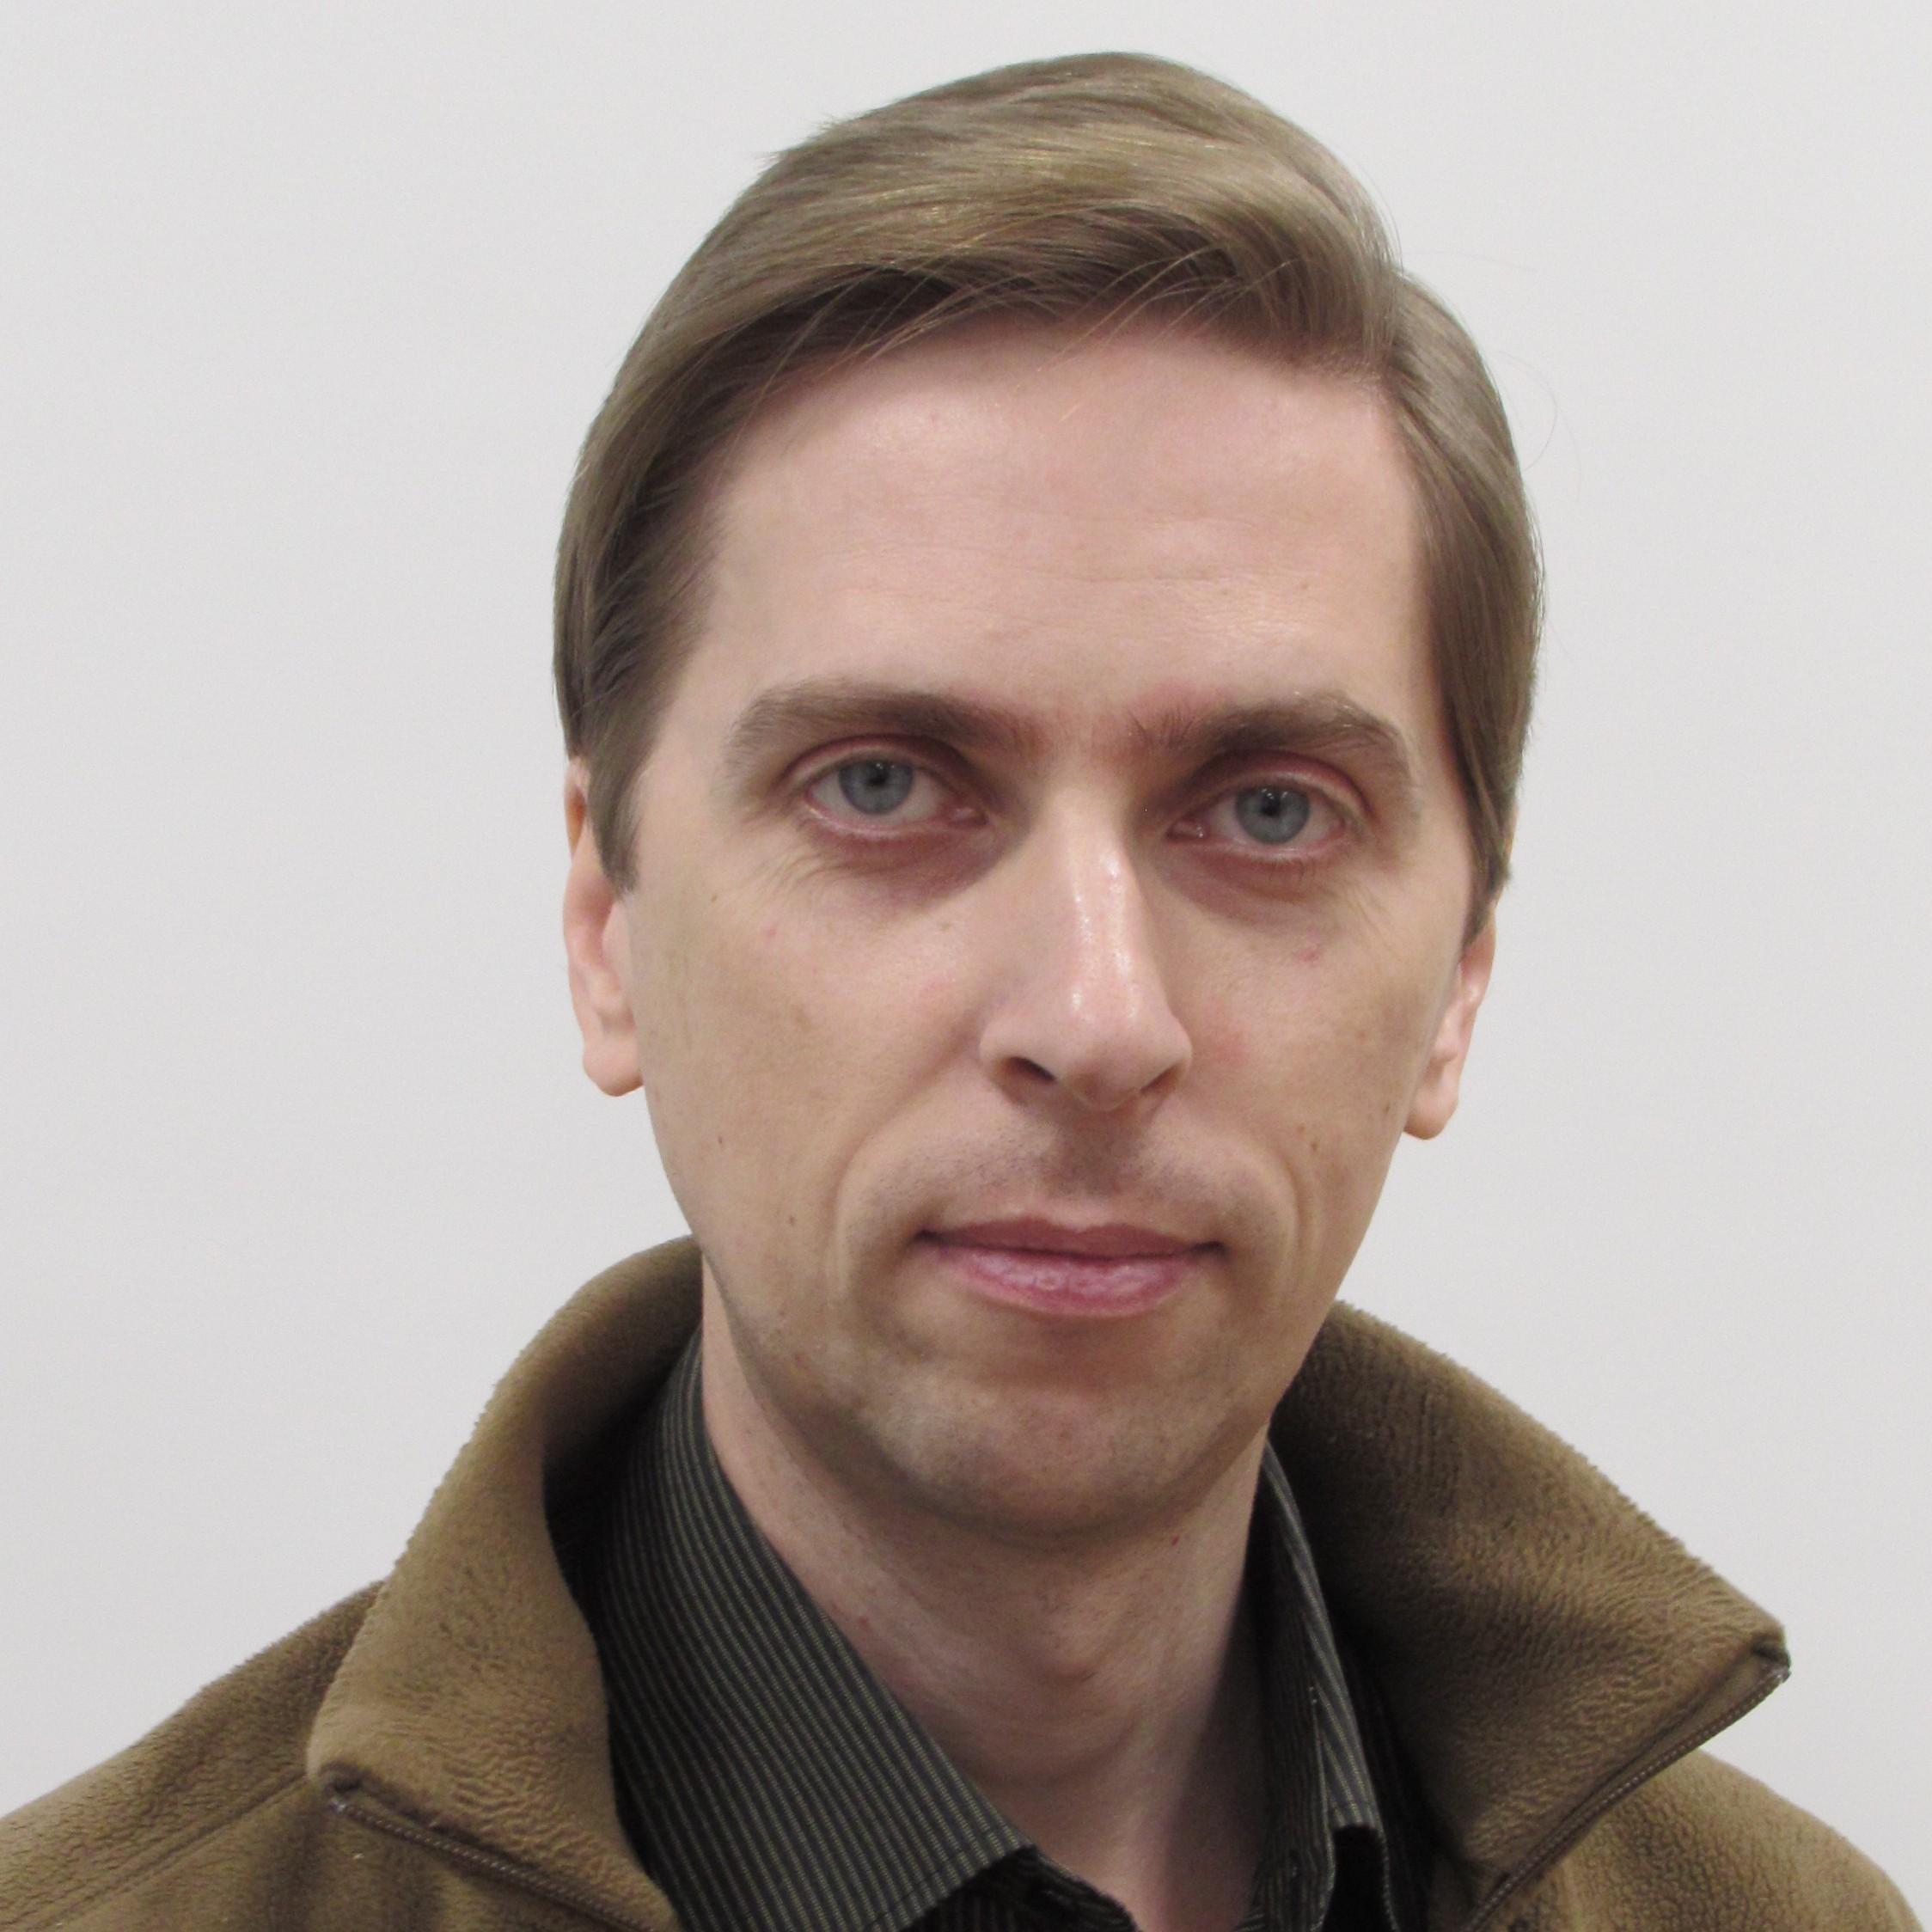 Кравцов Лев Геннадьевич